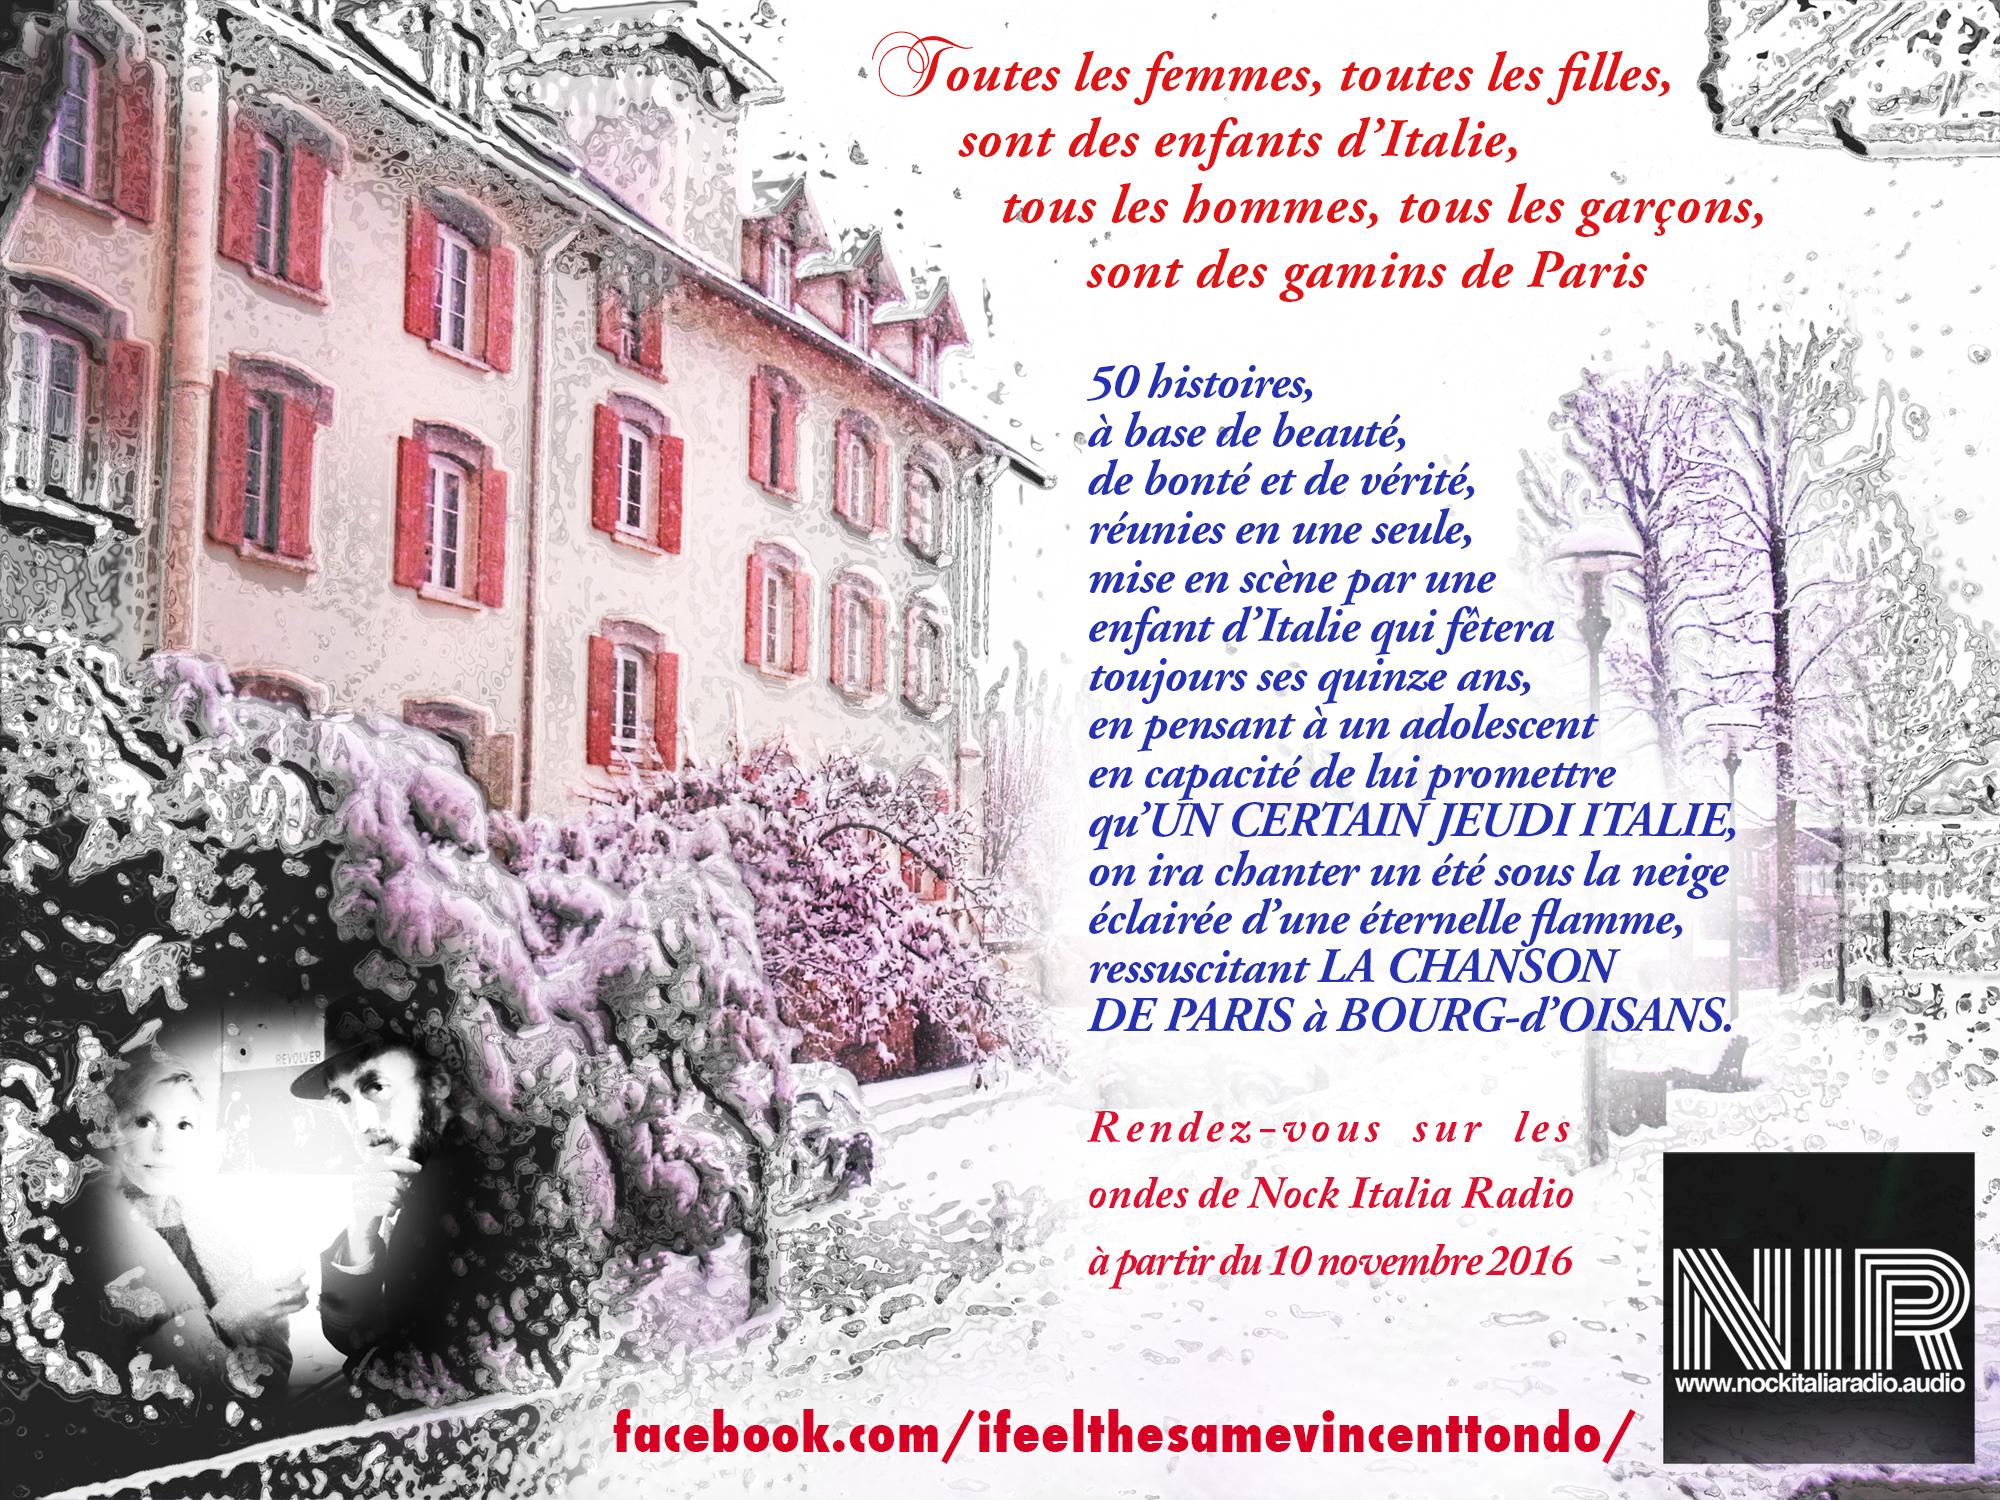 Rendez-vous Nock Italia Radio